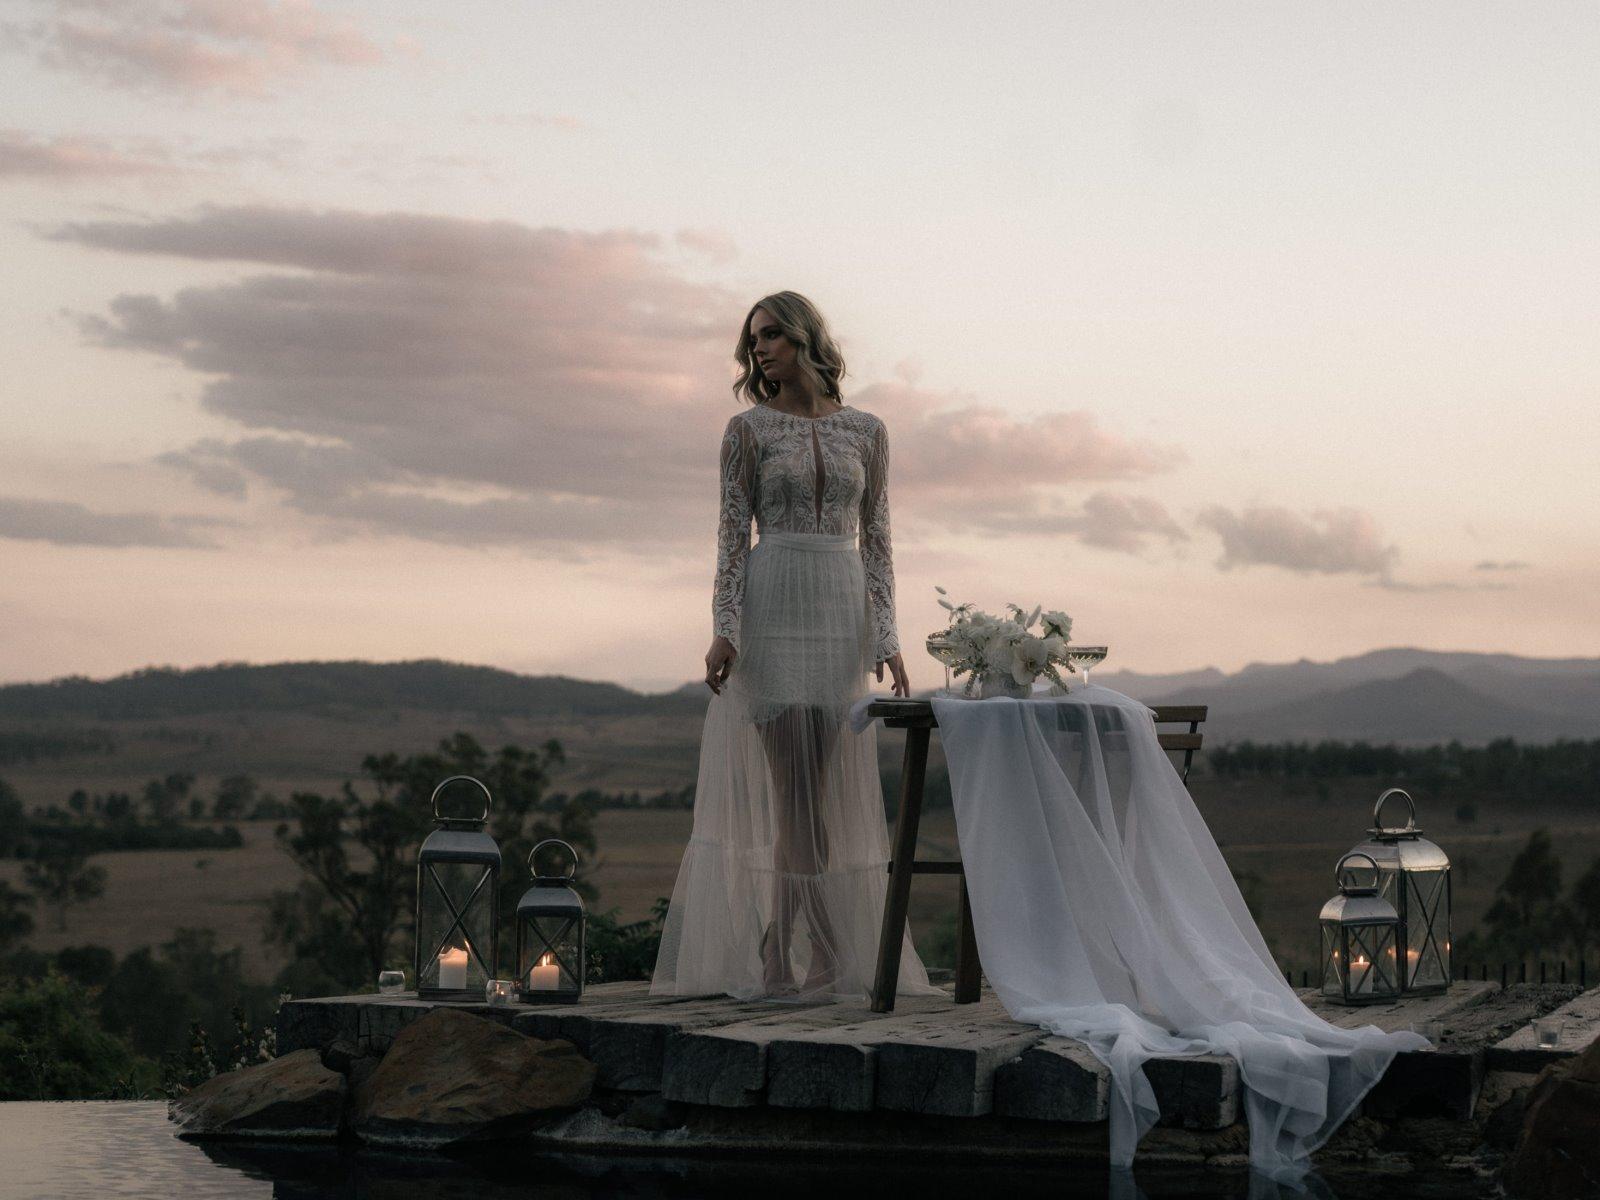 https://scenicrimbride.com.au/wp-content/uploads/2019/12/Scenic-Rim-Bride-Spicers-Hidden-Vale-0010.jpg